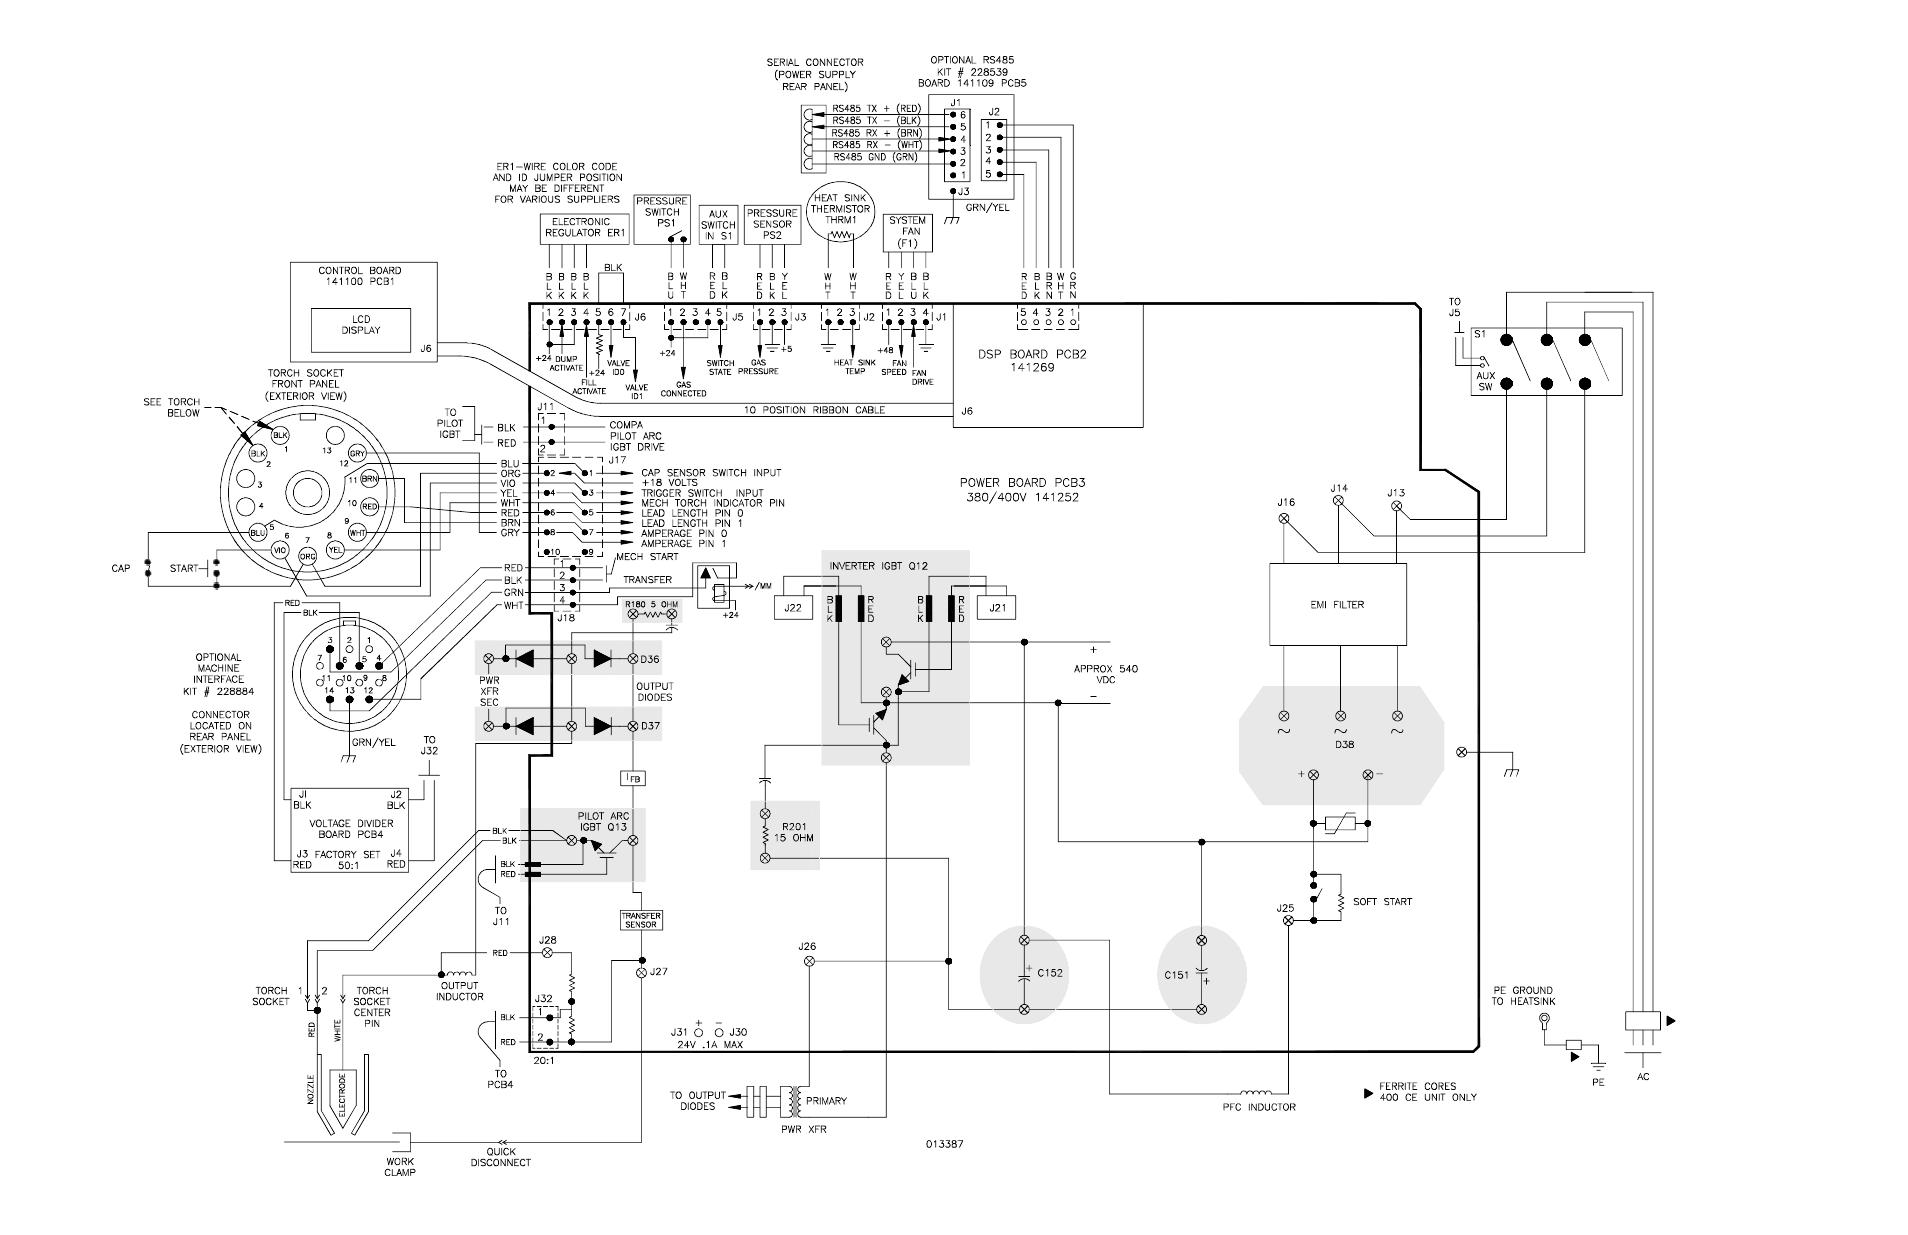 Schematic Diagram  380 V Ccc  400 V Ce   Schematic Diagram  380 V Ccc  400 V Ce